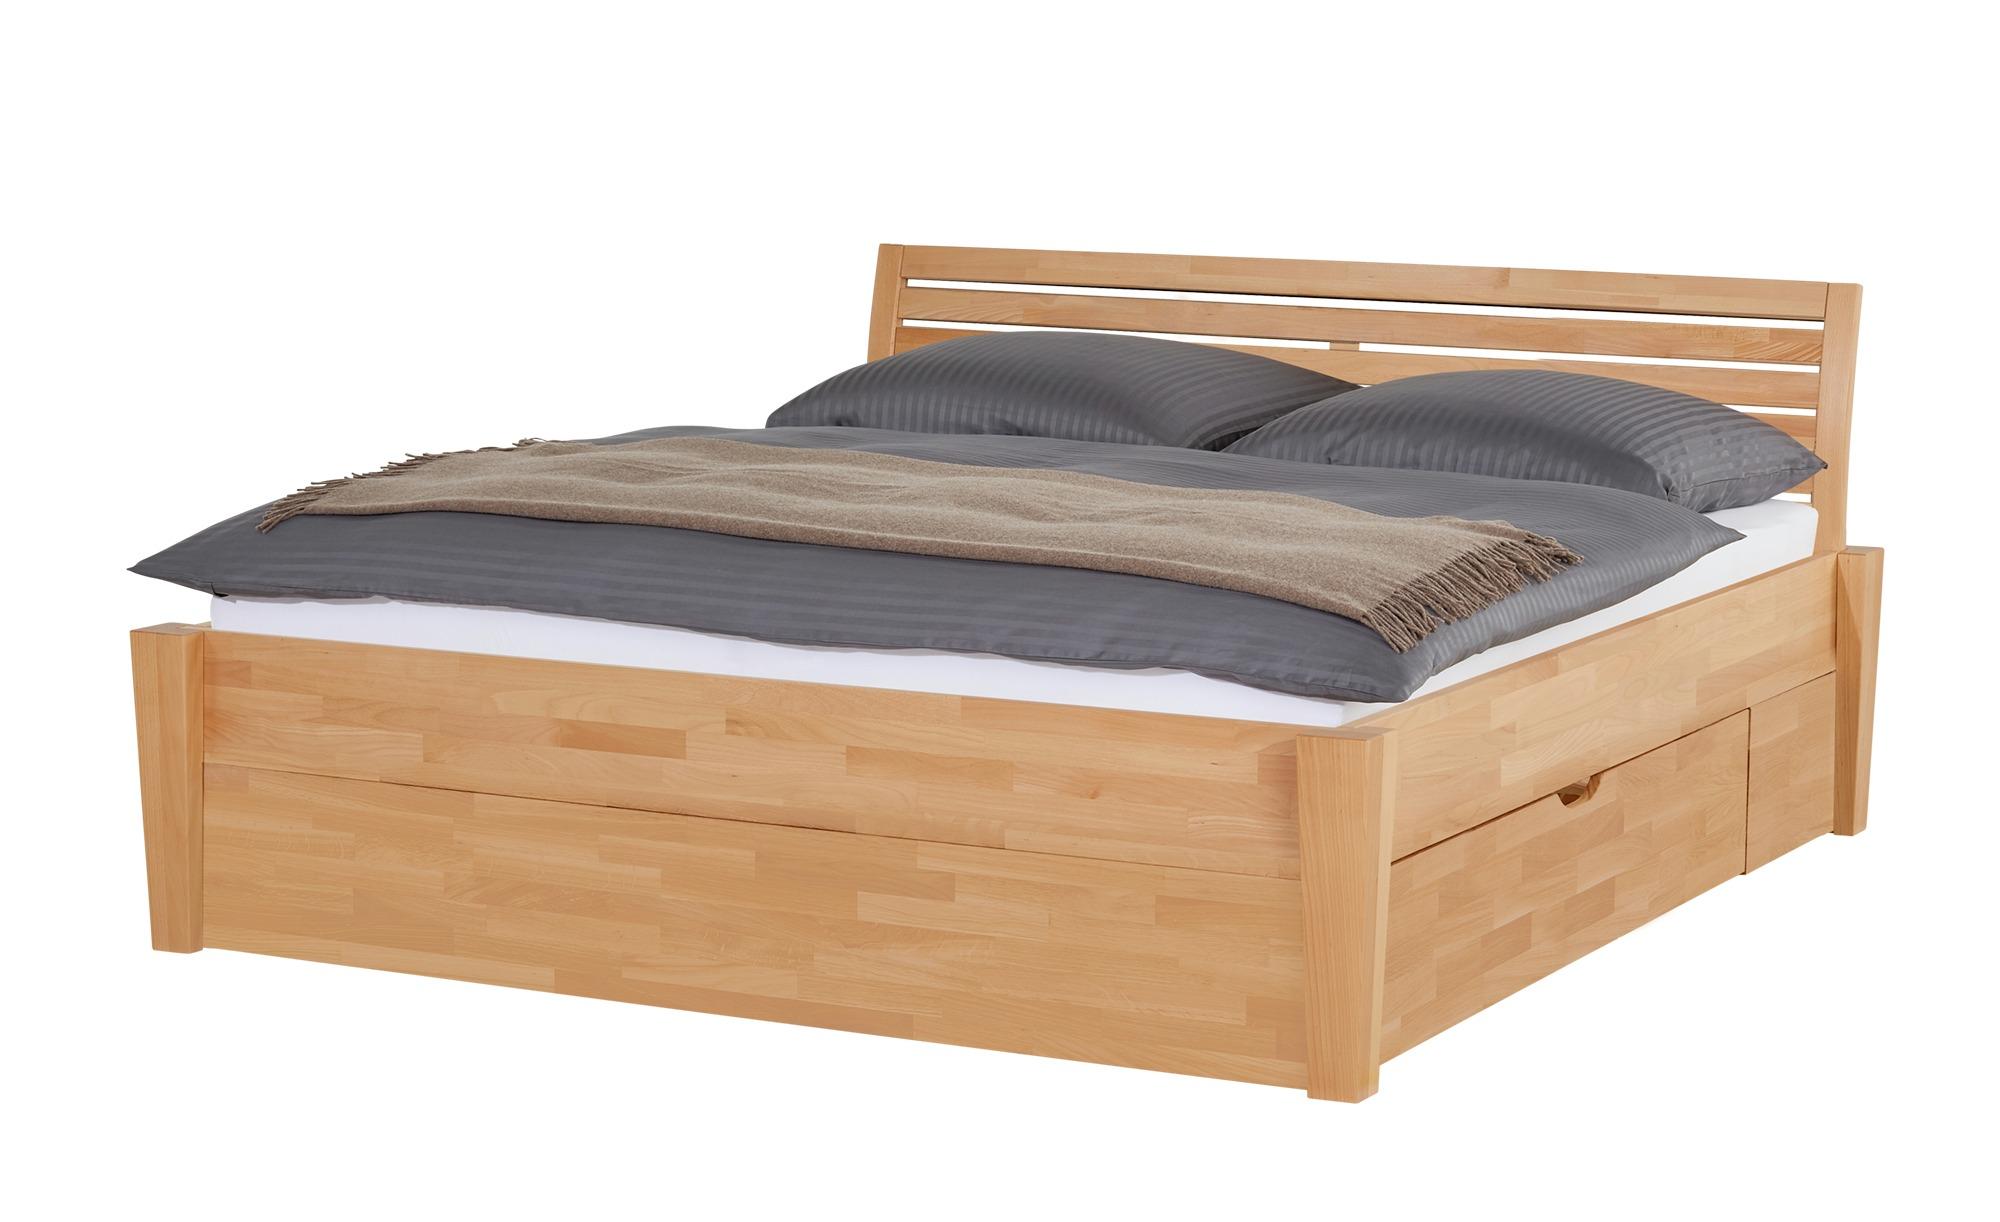 Massivholz-Bettgestell mit Bettkasten Timber ¦ holzfarben ¦ Maße (cm): B: 156 H: 93 Betten > Futonbetten - Höffner